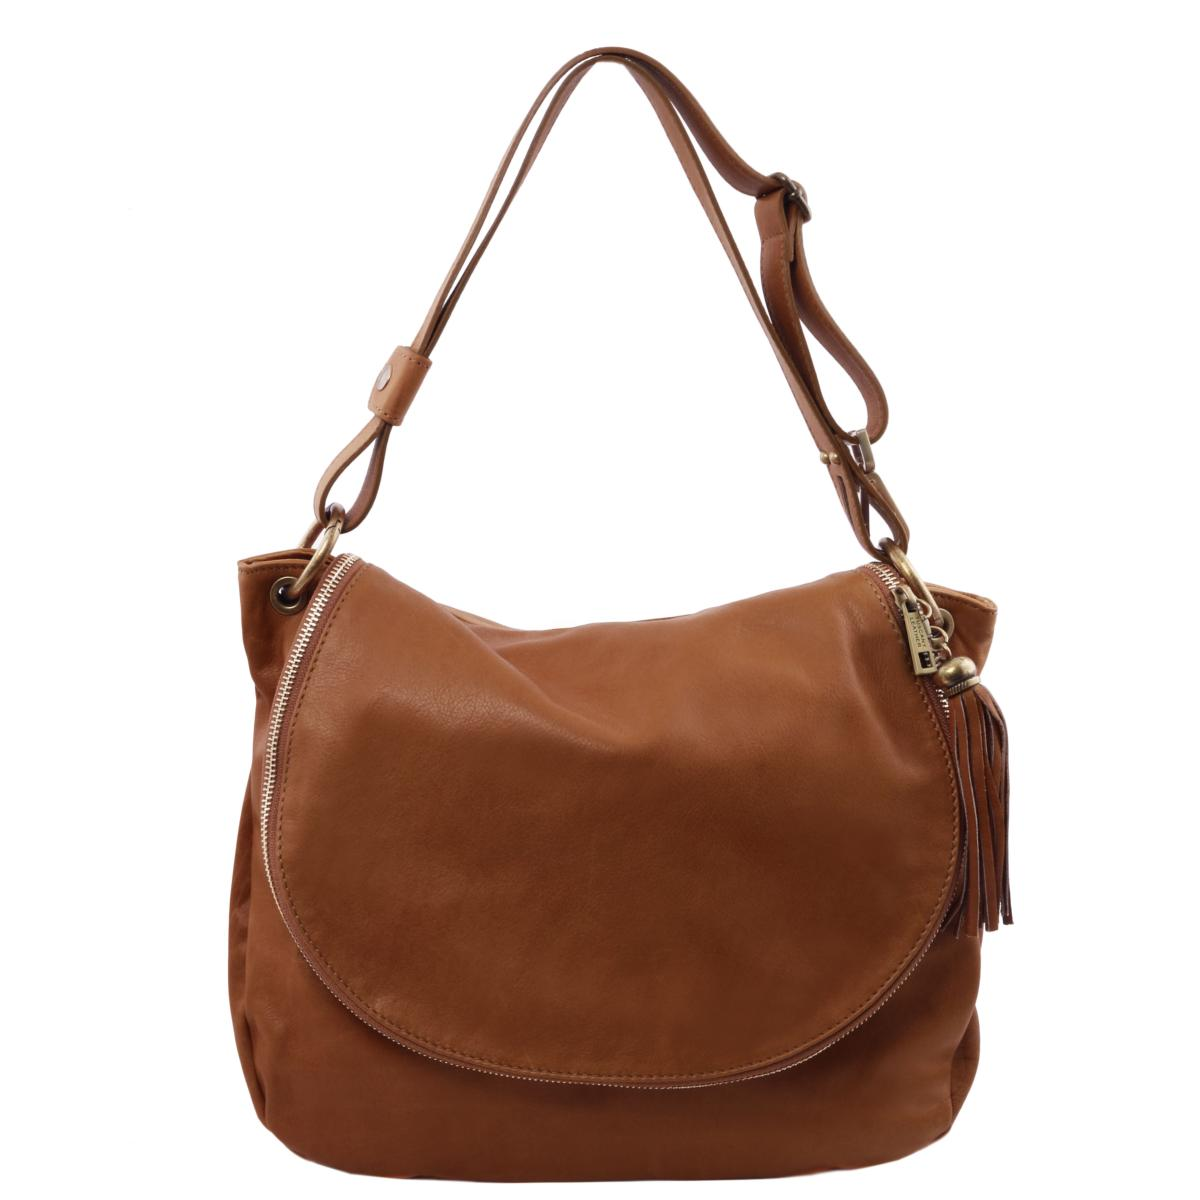 Destockage Grand Sac Cuir Bandoulière Besace Femme Marron Clair - Tuscany  Leather -